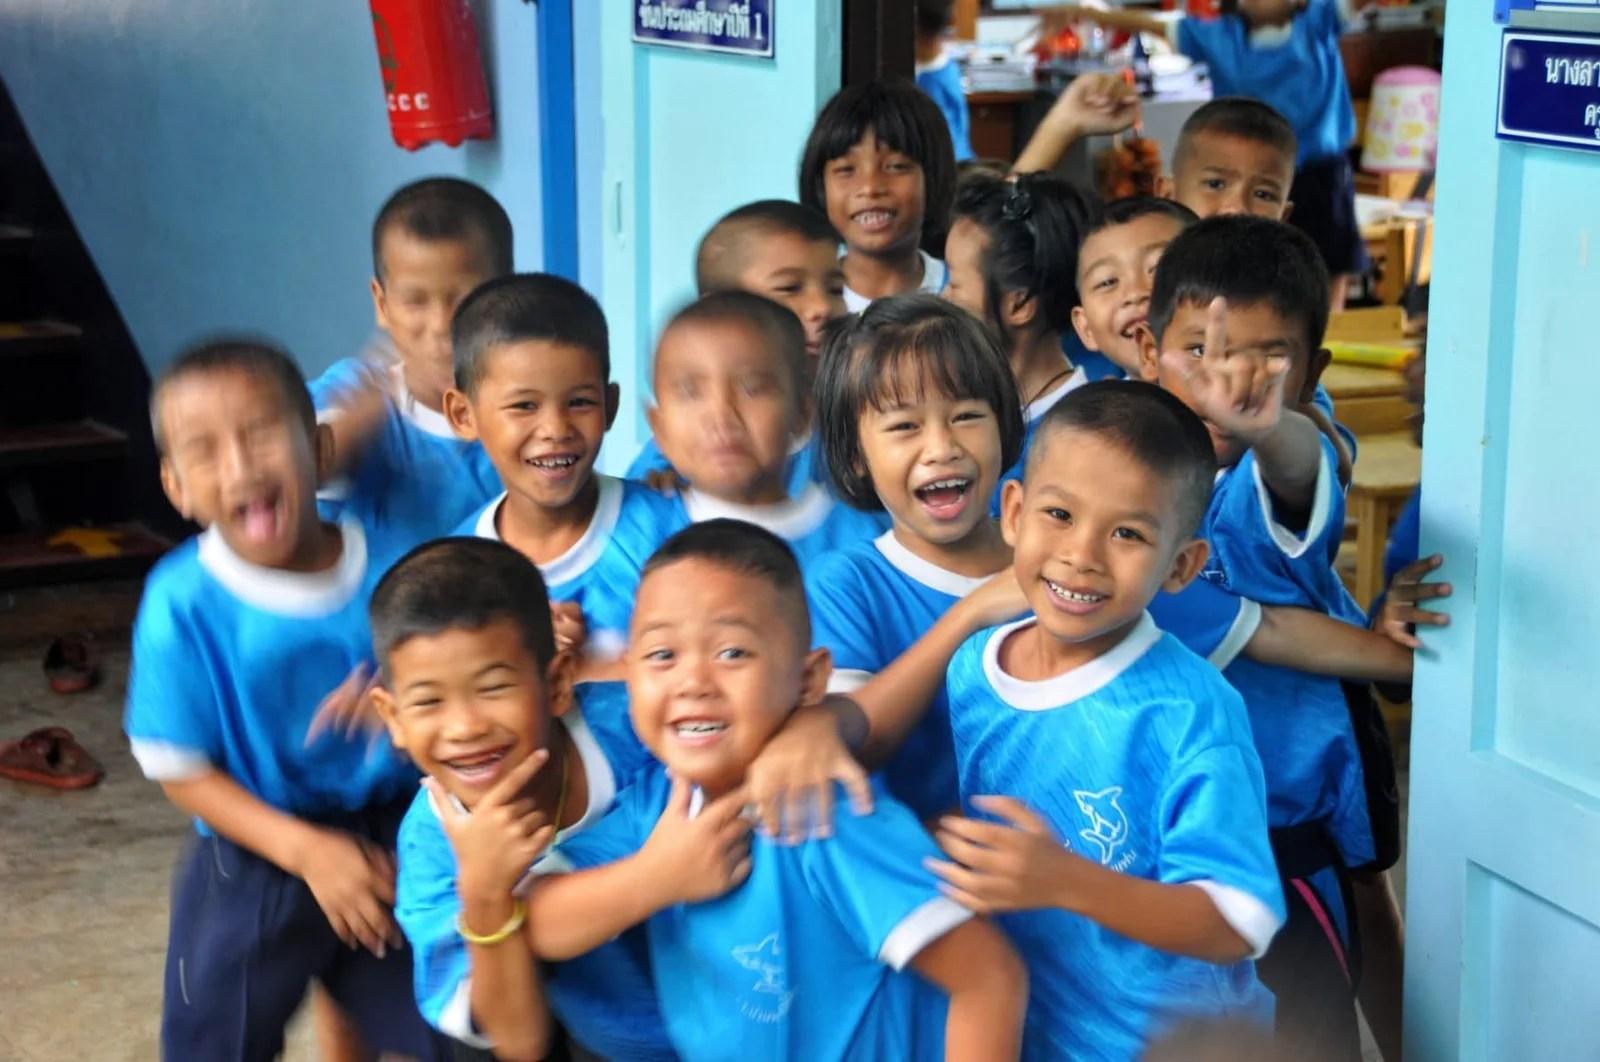 enfants ecole - map ta phut - rayong - thailande